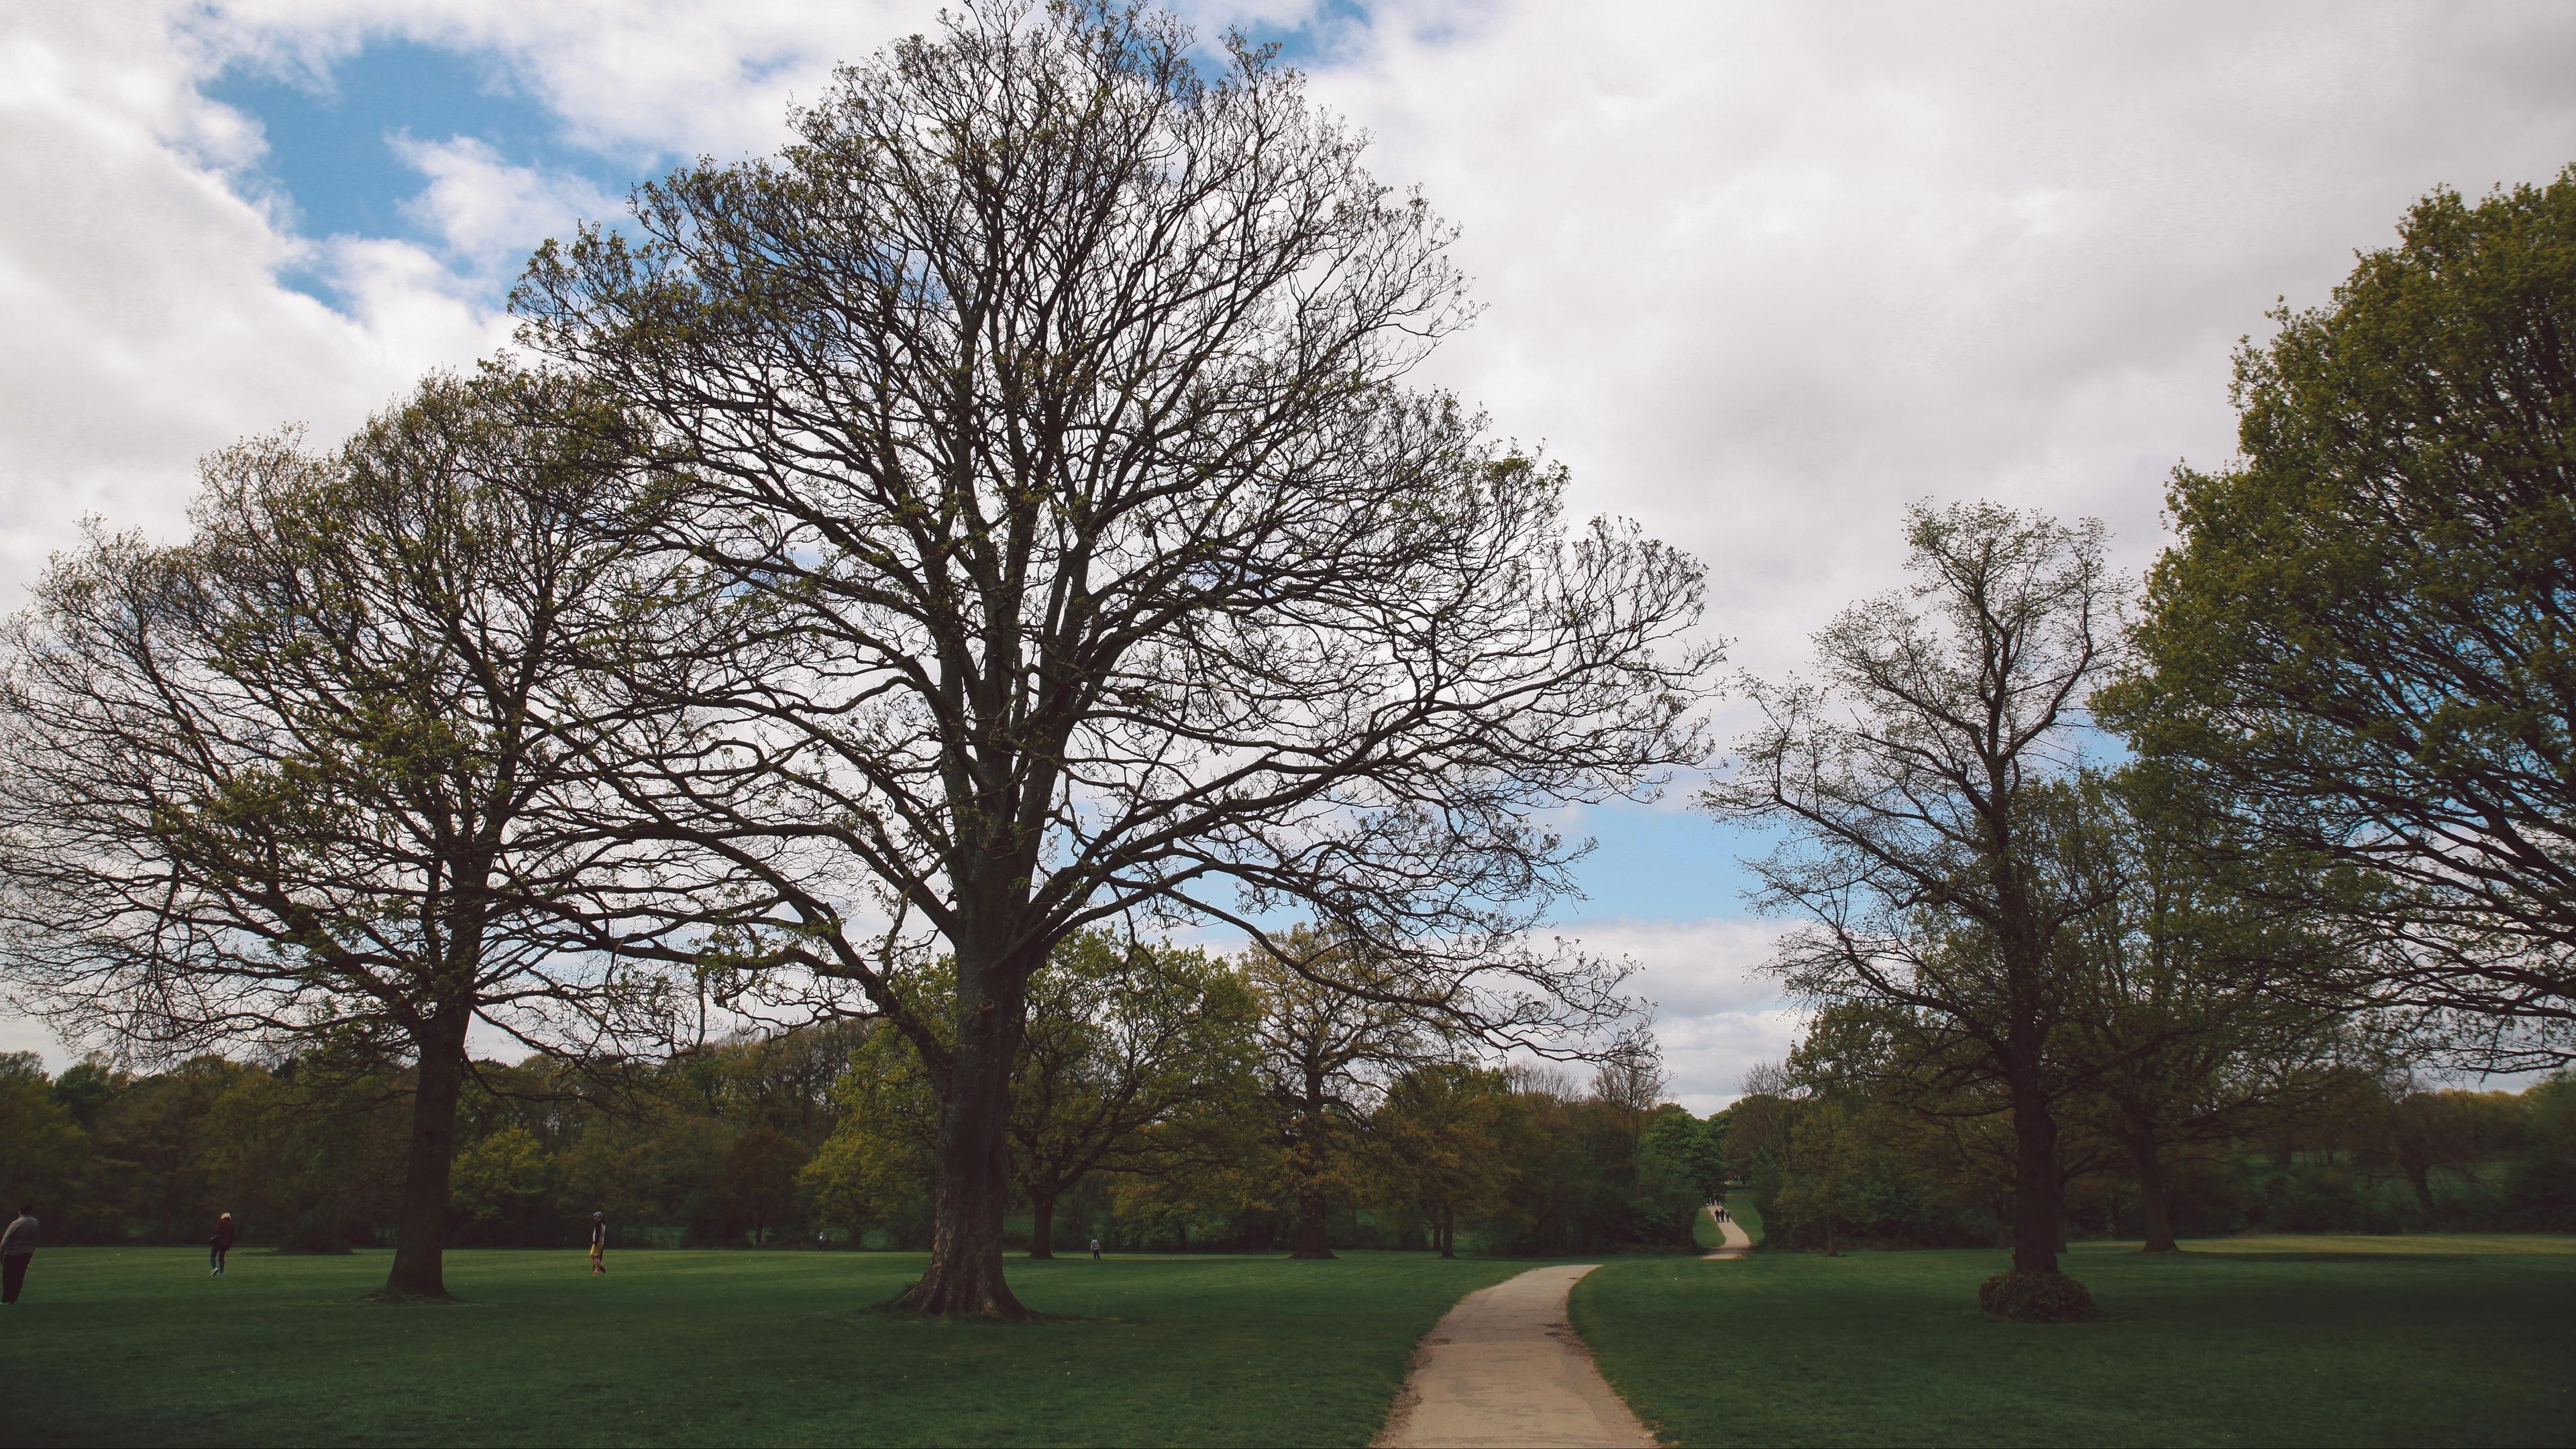 park path trees garden 4k 1541113463 - park, path, trees, garden 4k - Trees, path, Park